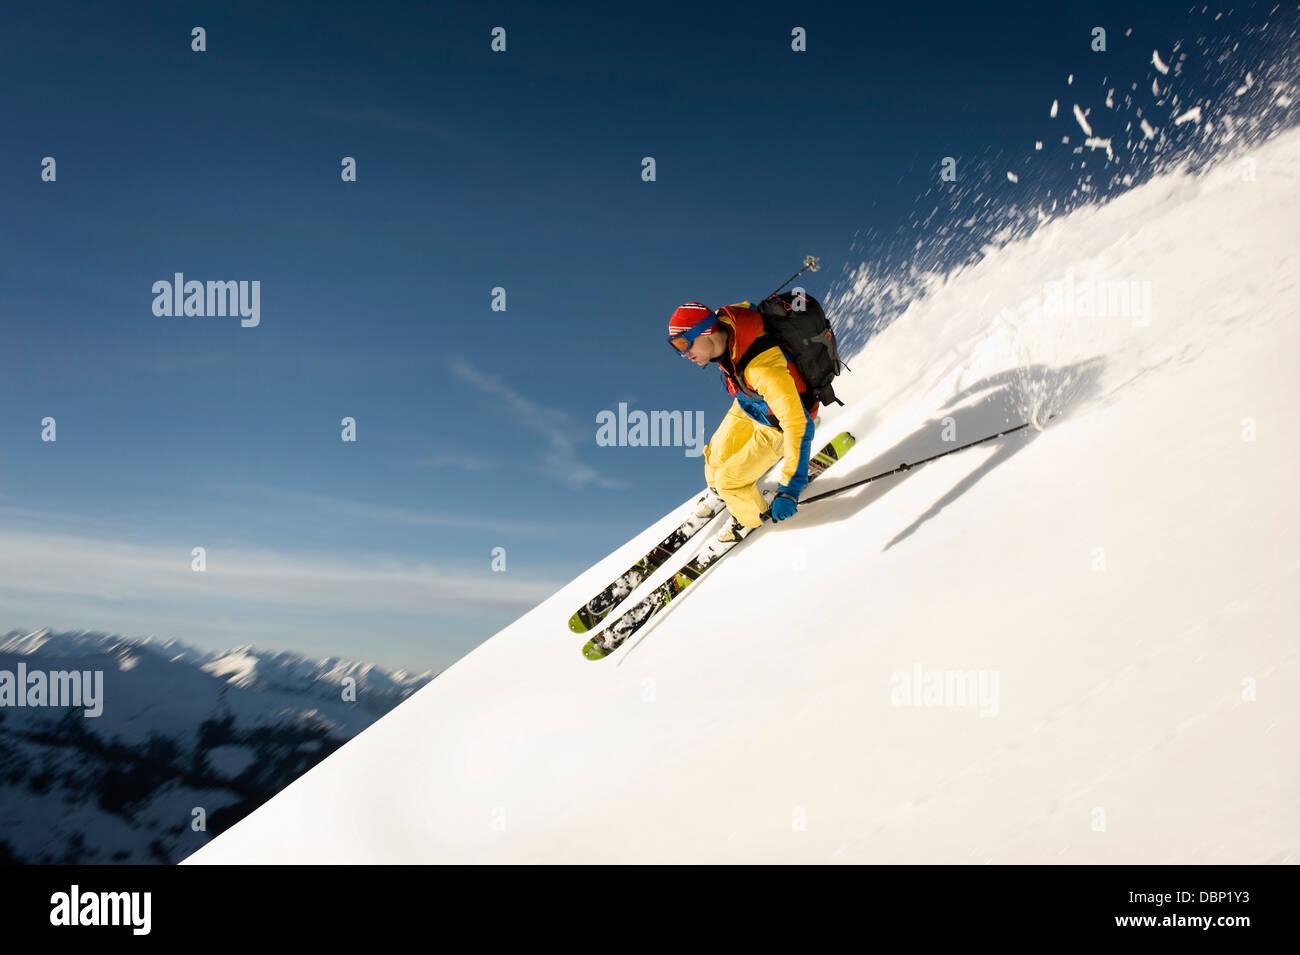 Backcountry skier skiing downhill, Alpbachtal, Tyrol, Austria, Europe Stock Photo